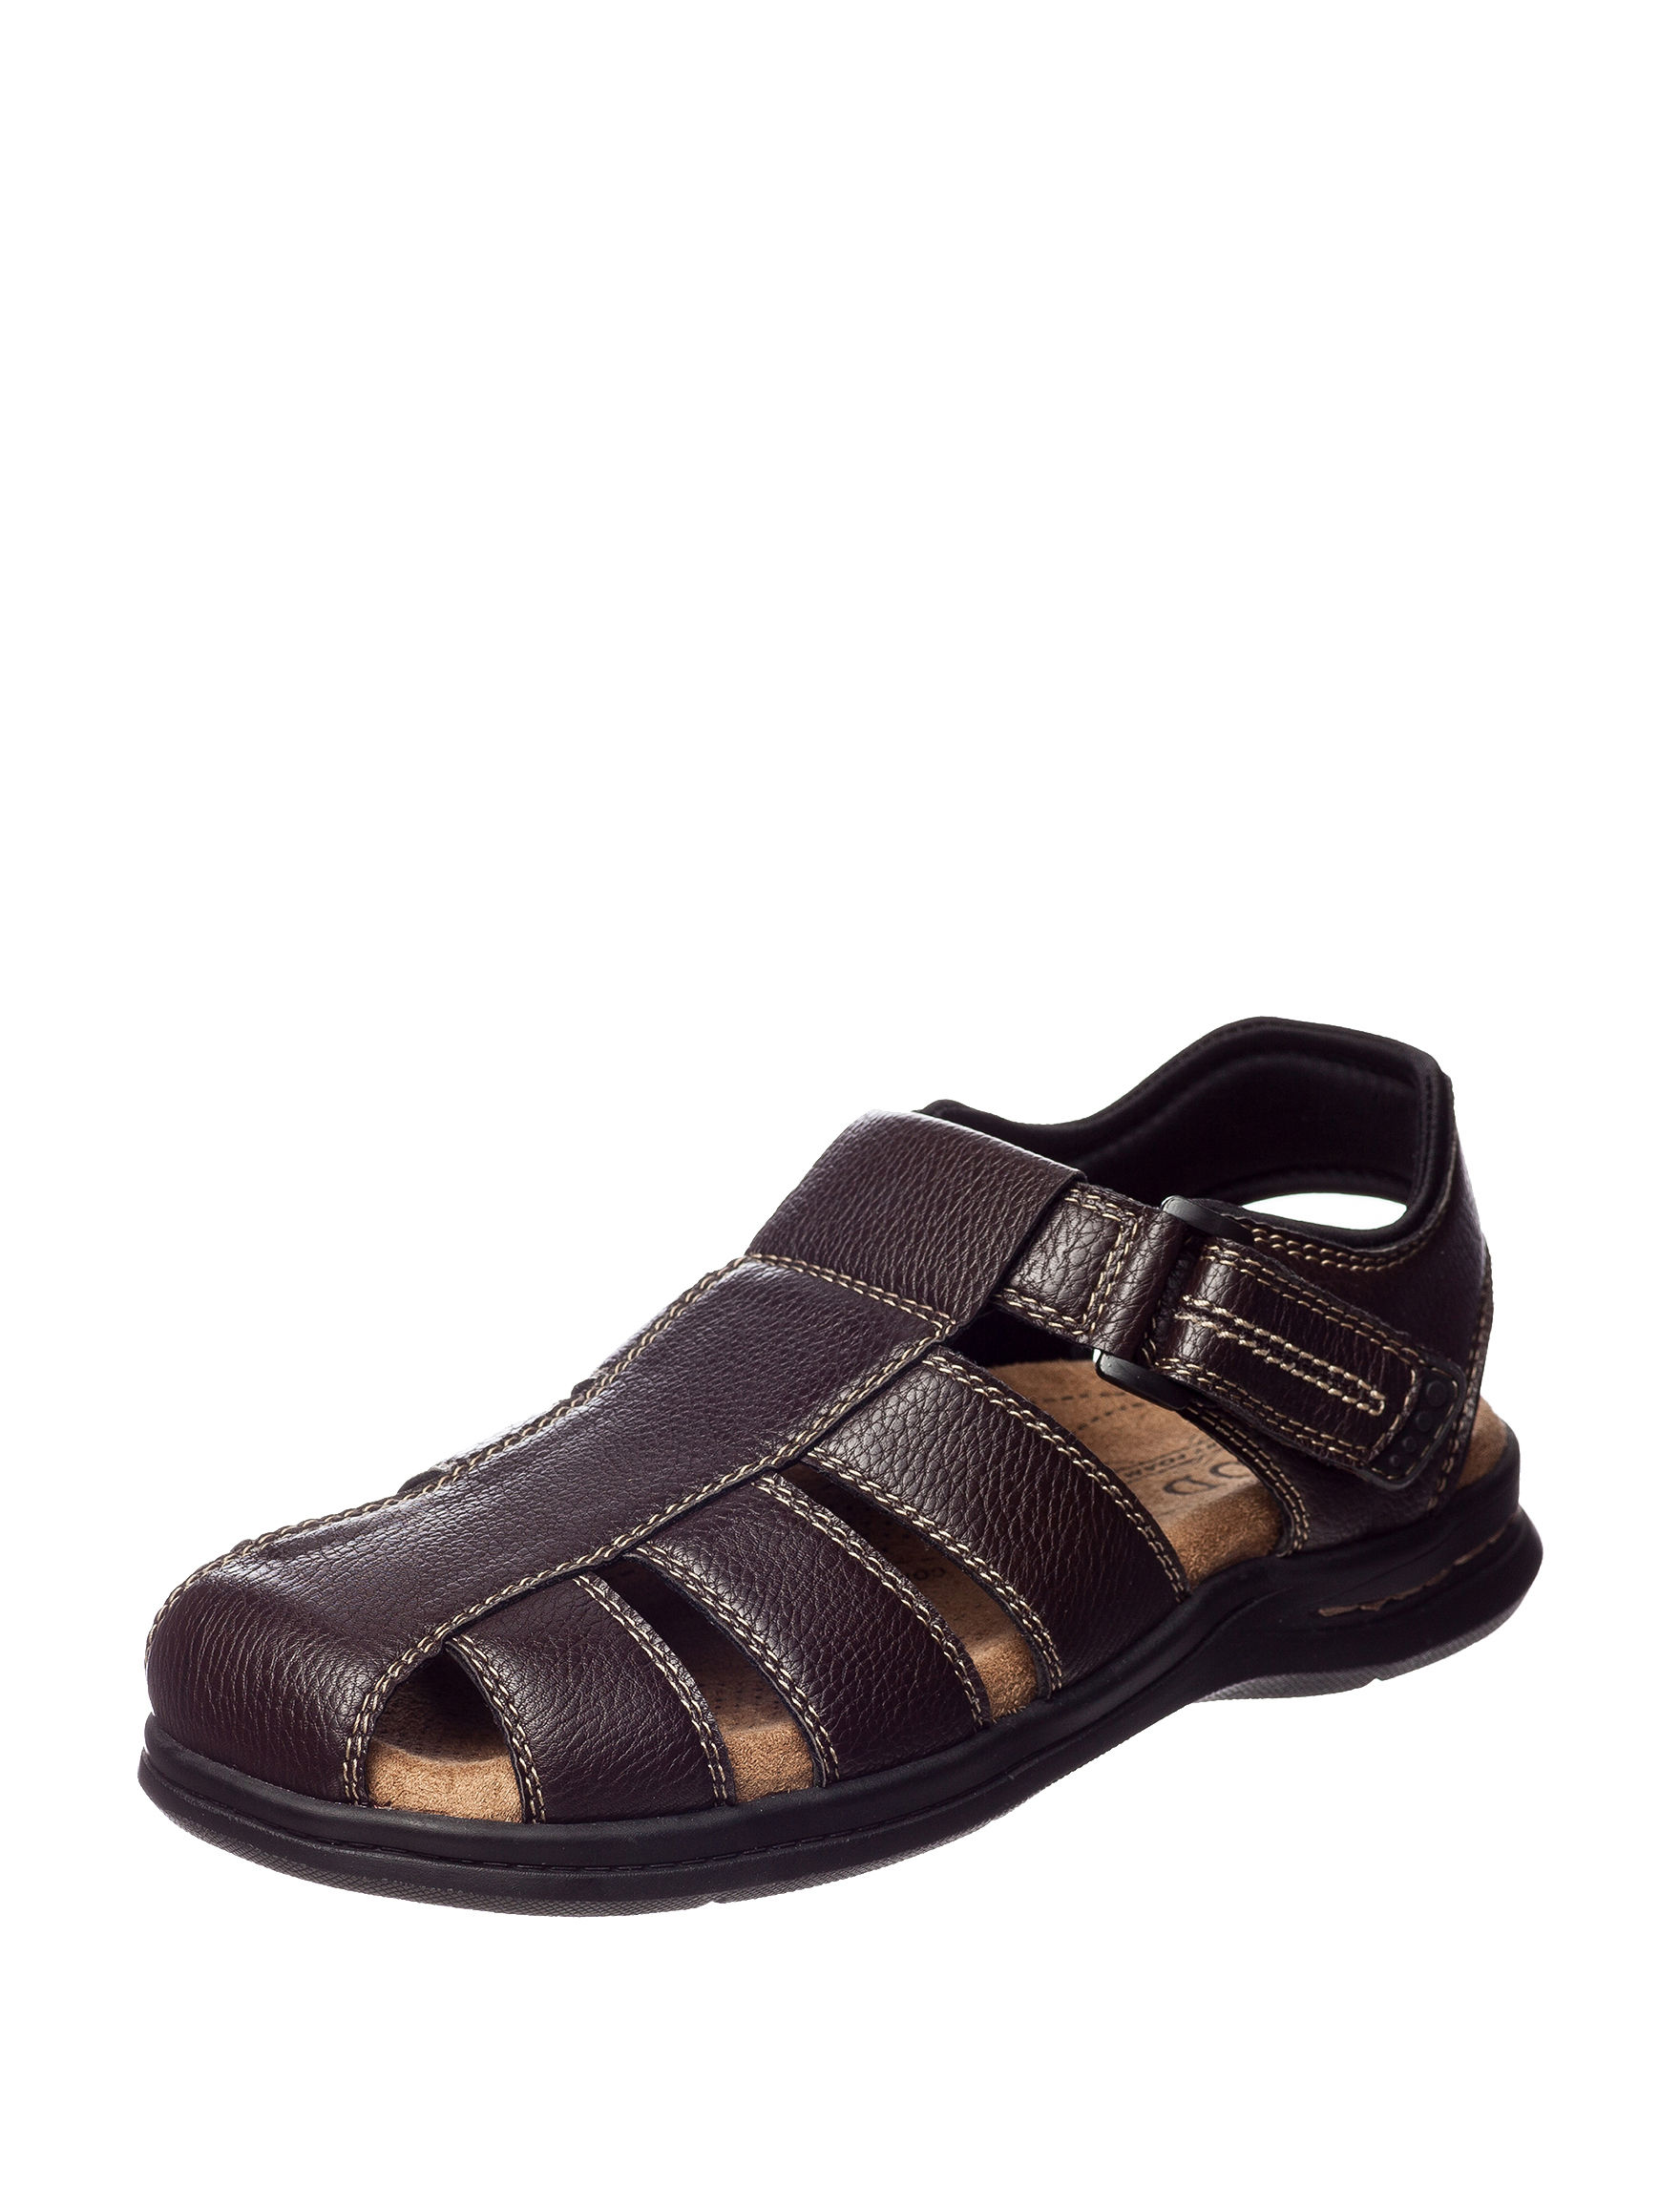 Izod Dark Brown Fisherman Sandals